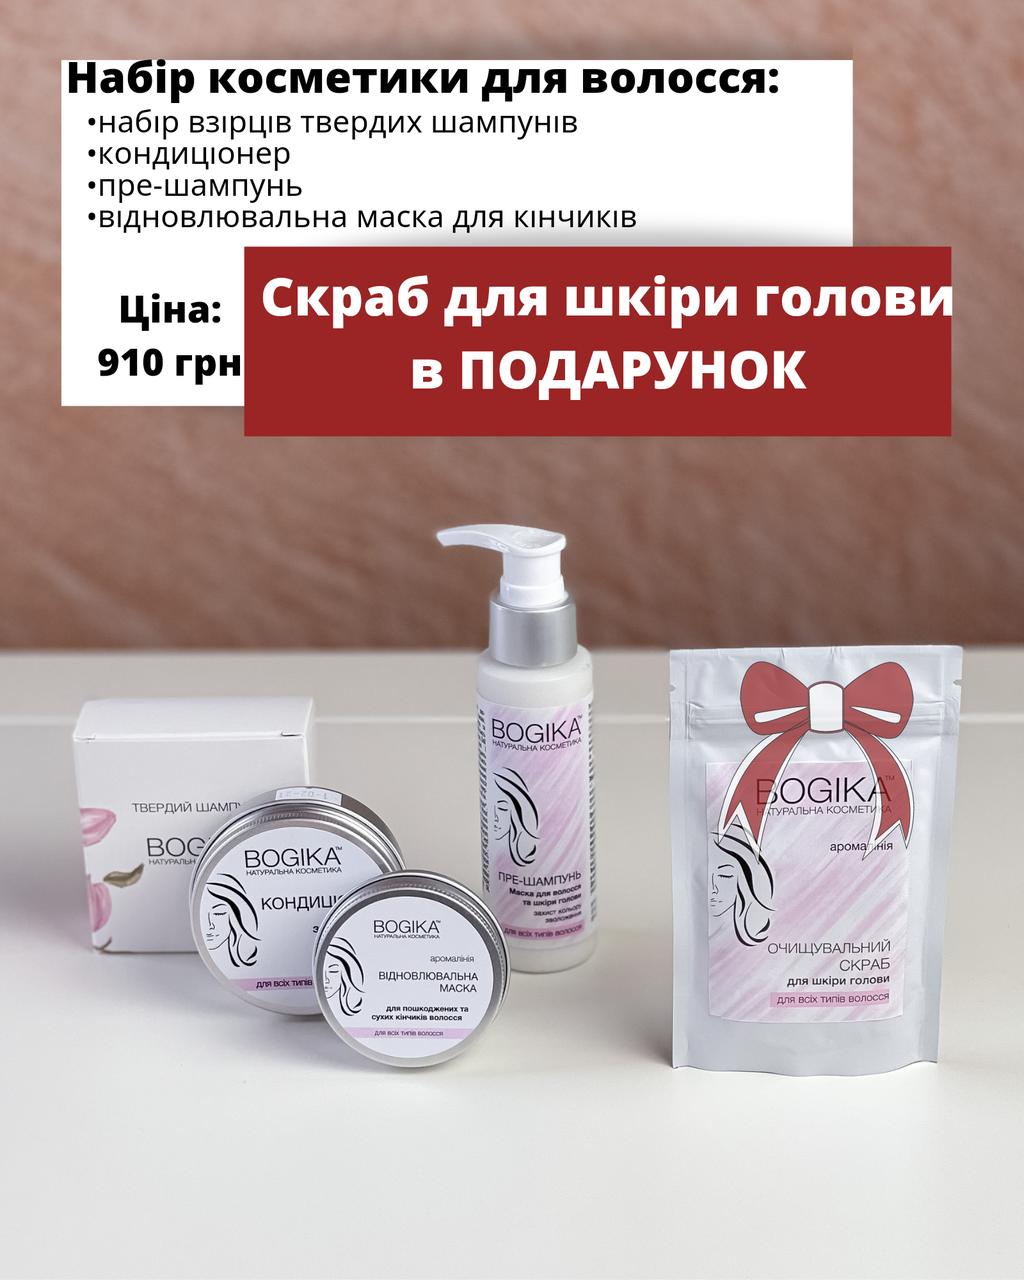 Набір косметики для волосся BOGIKA